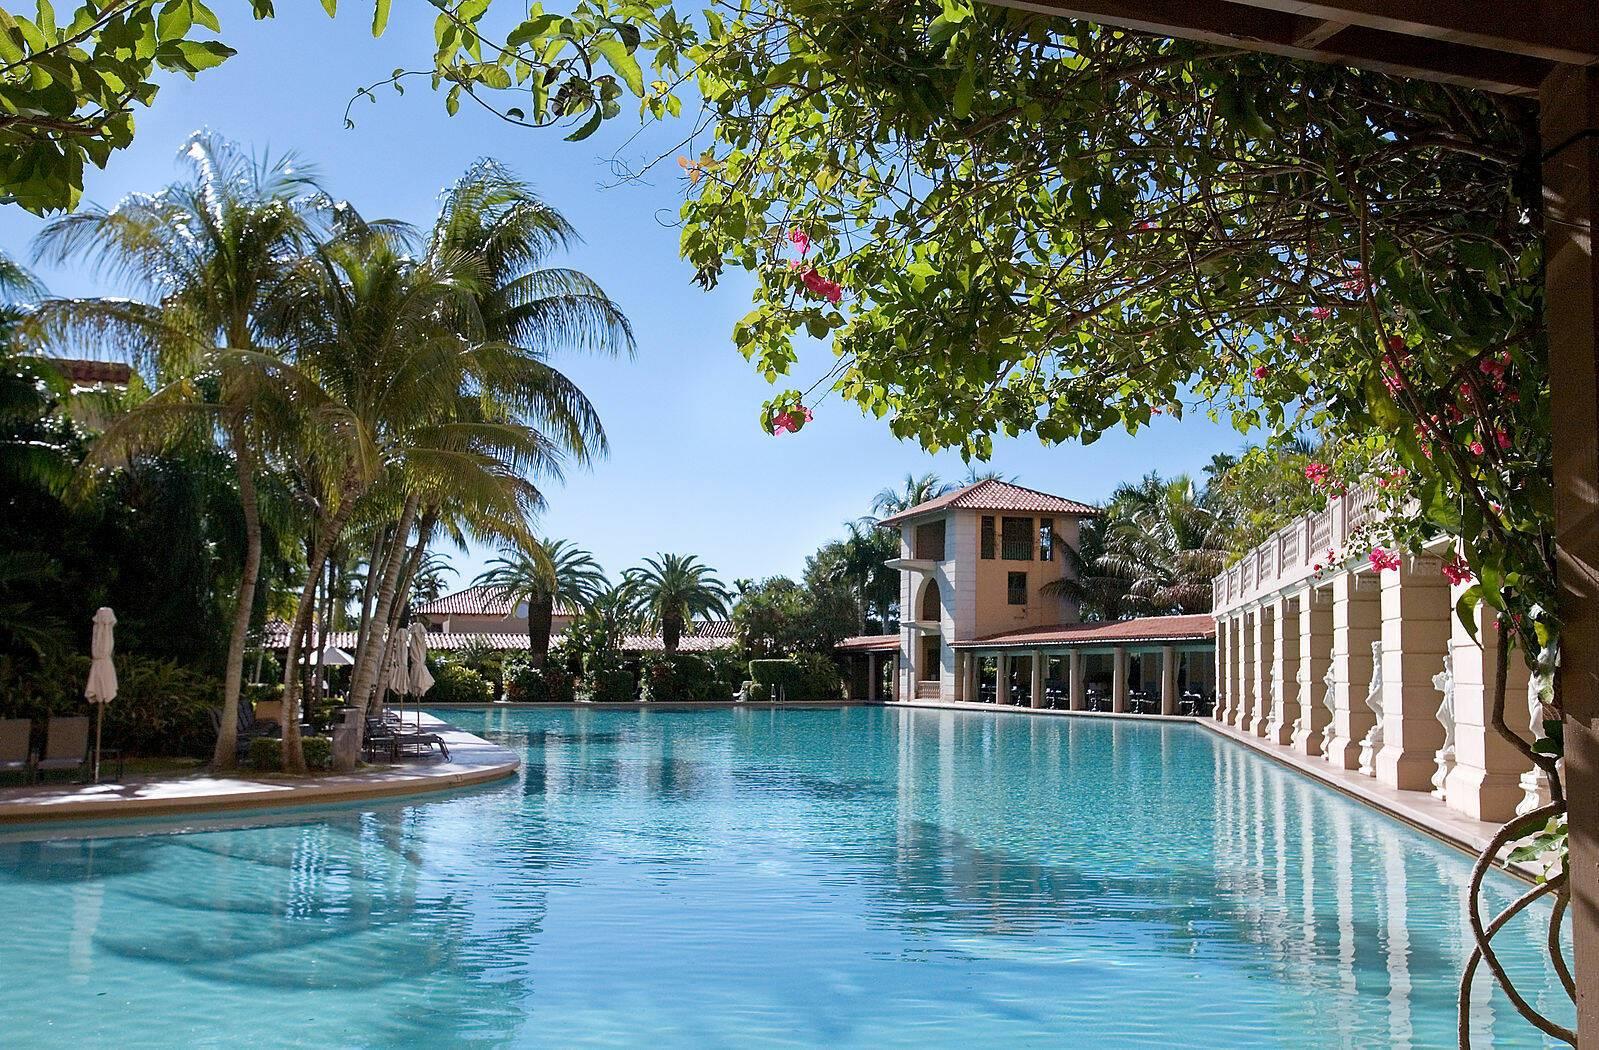 Miami Biltmore Piscine